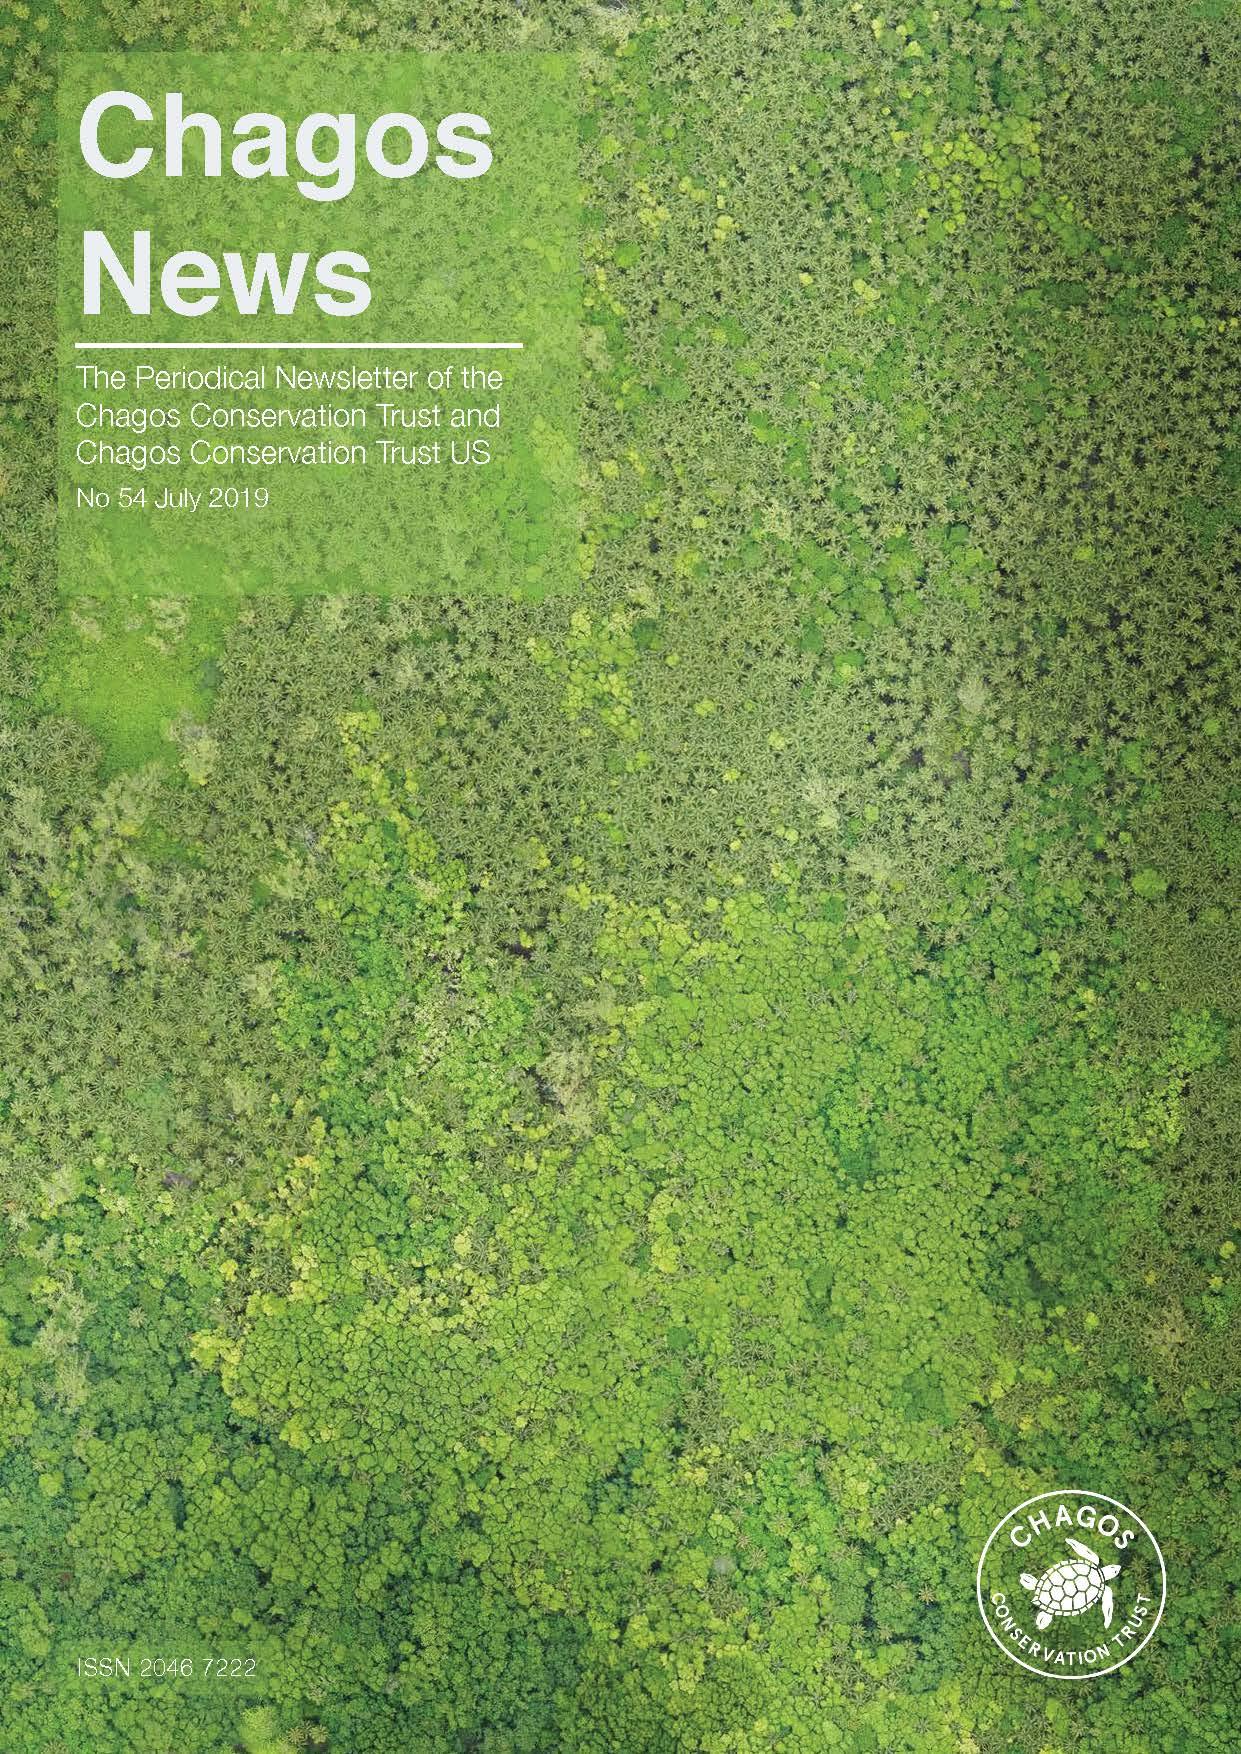 Chagos News issue #54